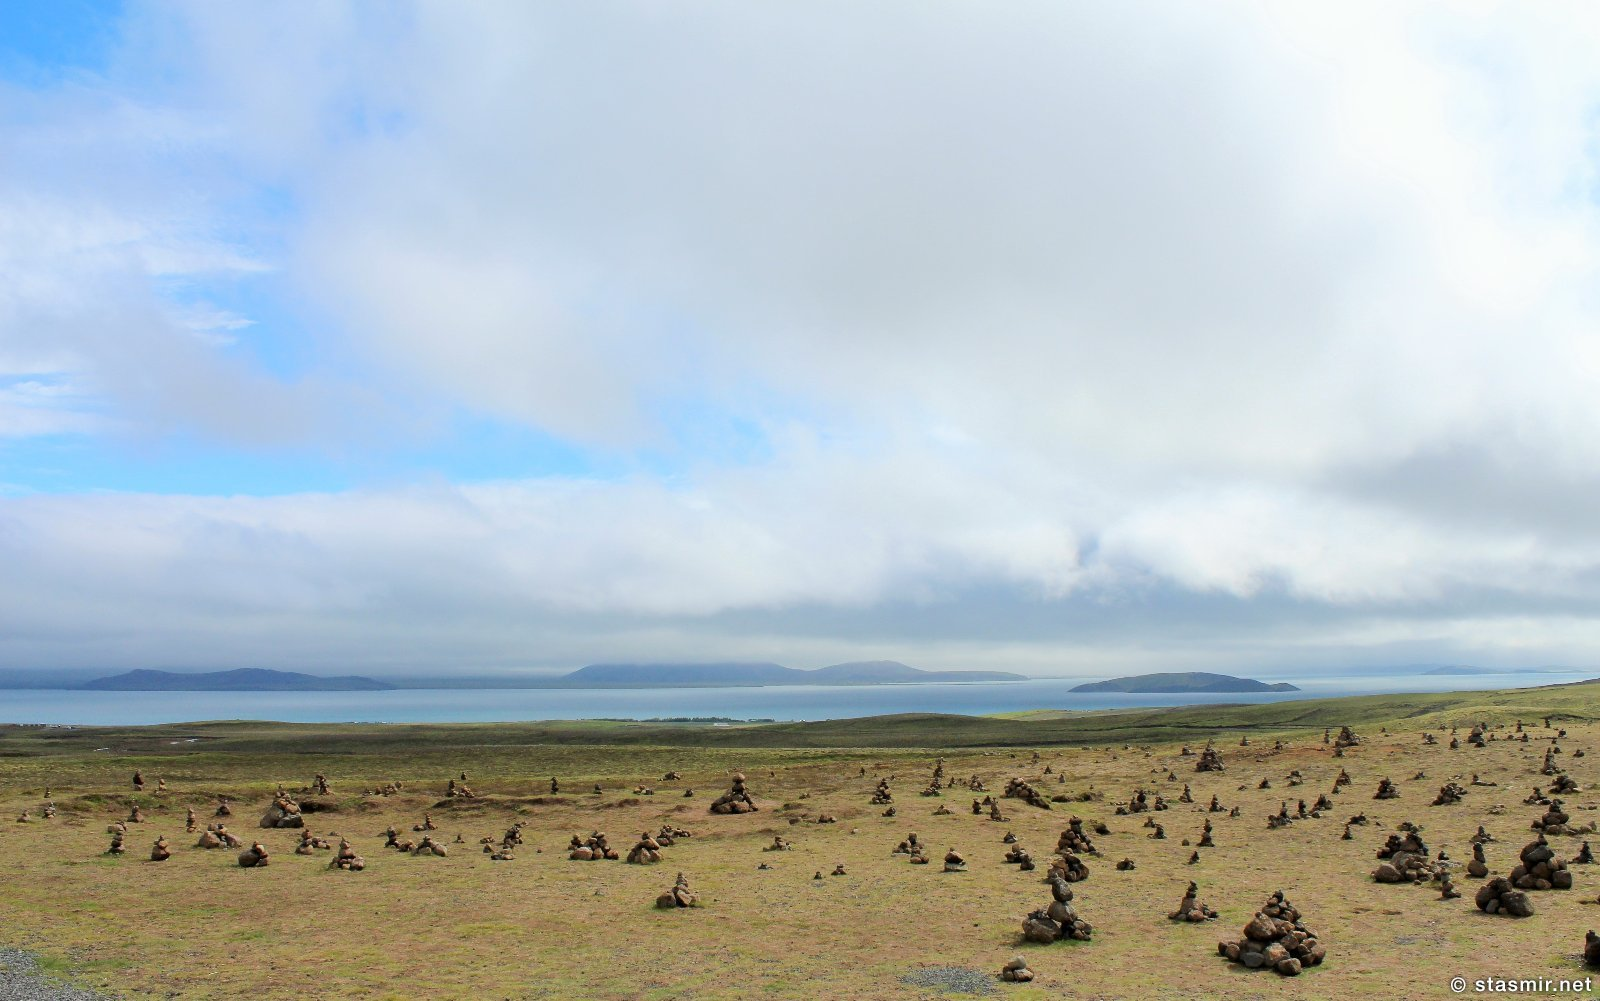 Þjóðgarðurinn á Þingvöllum, Национальные Парки Исландии, Тингведлир, пирамидки из камней,